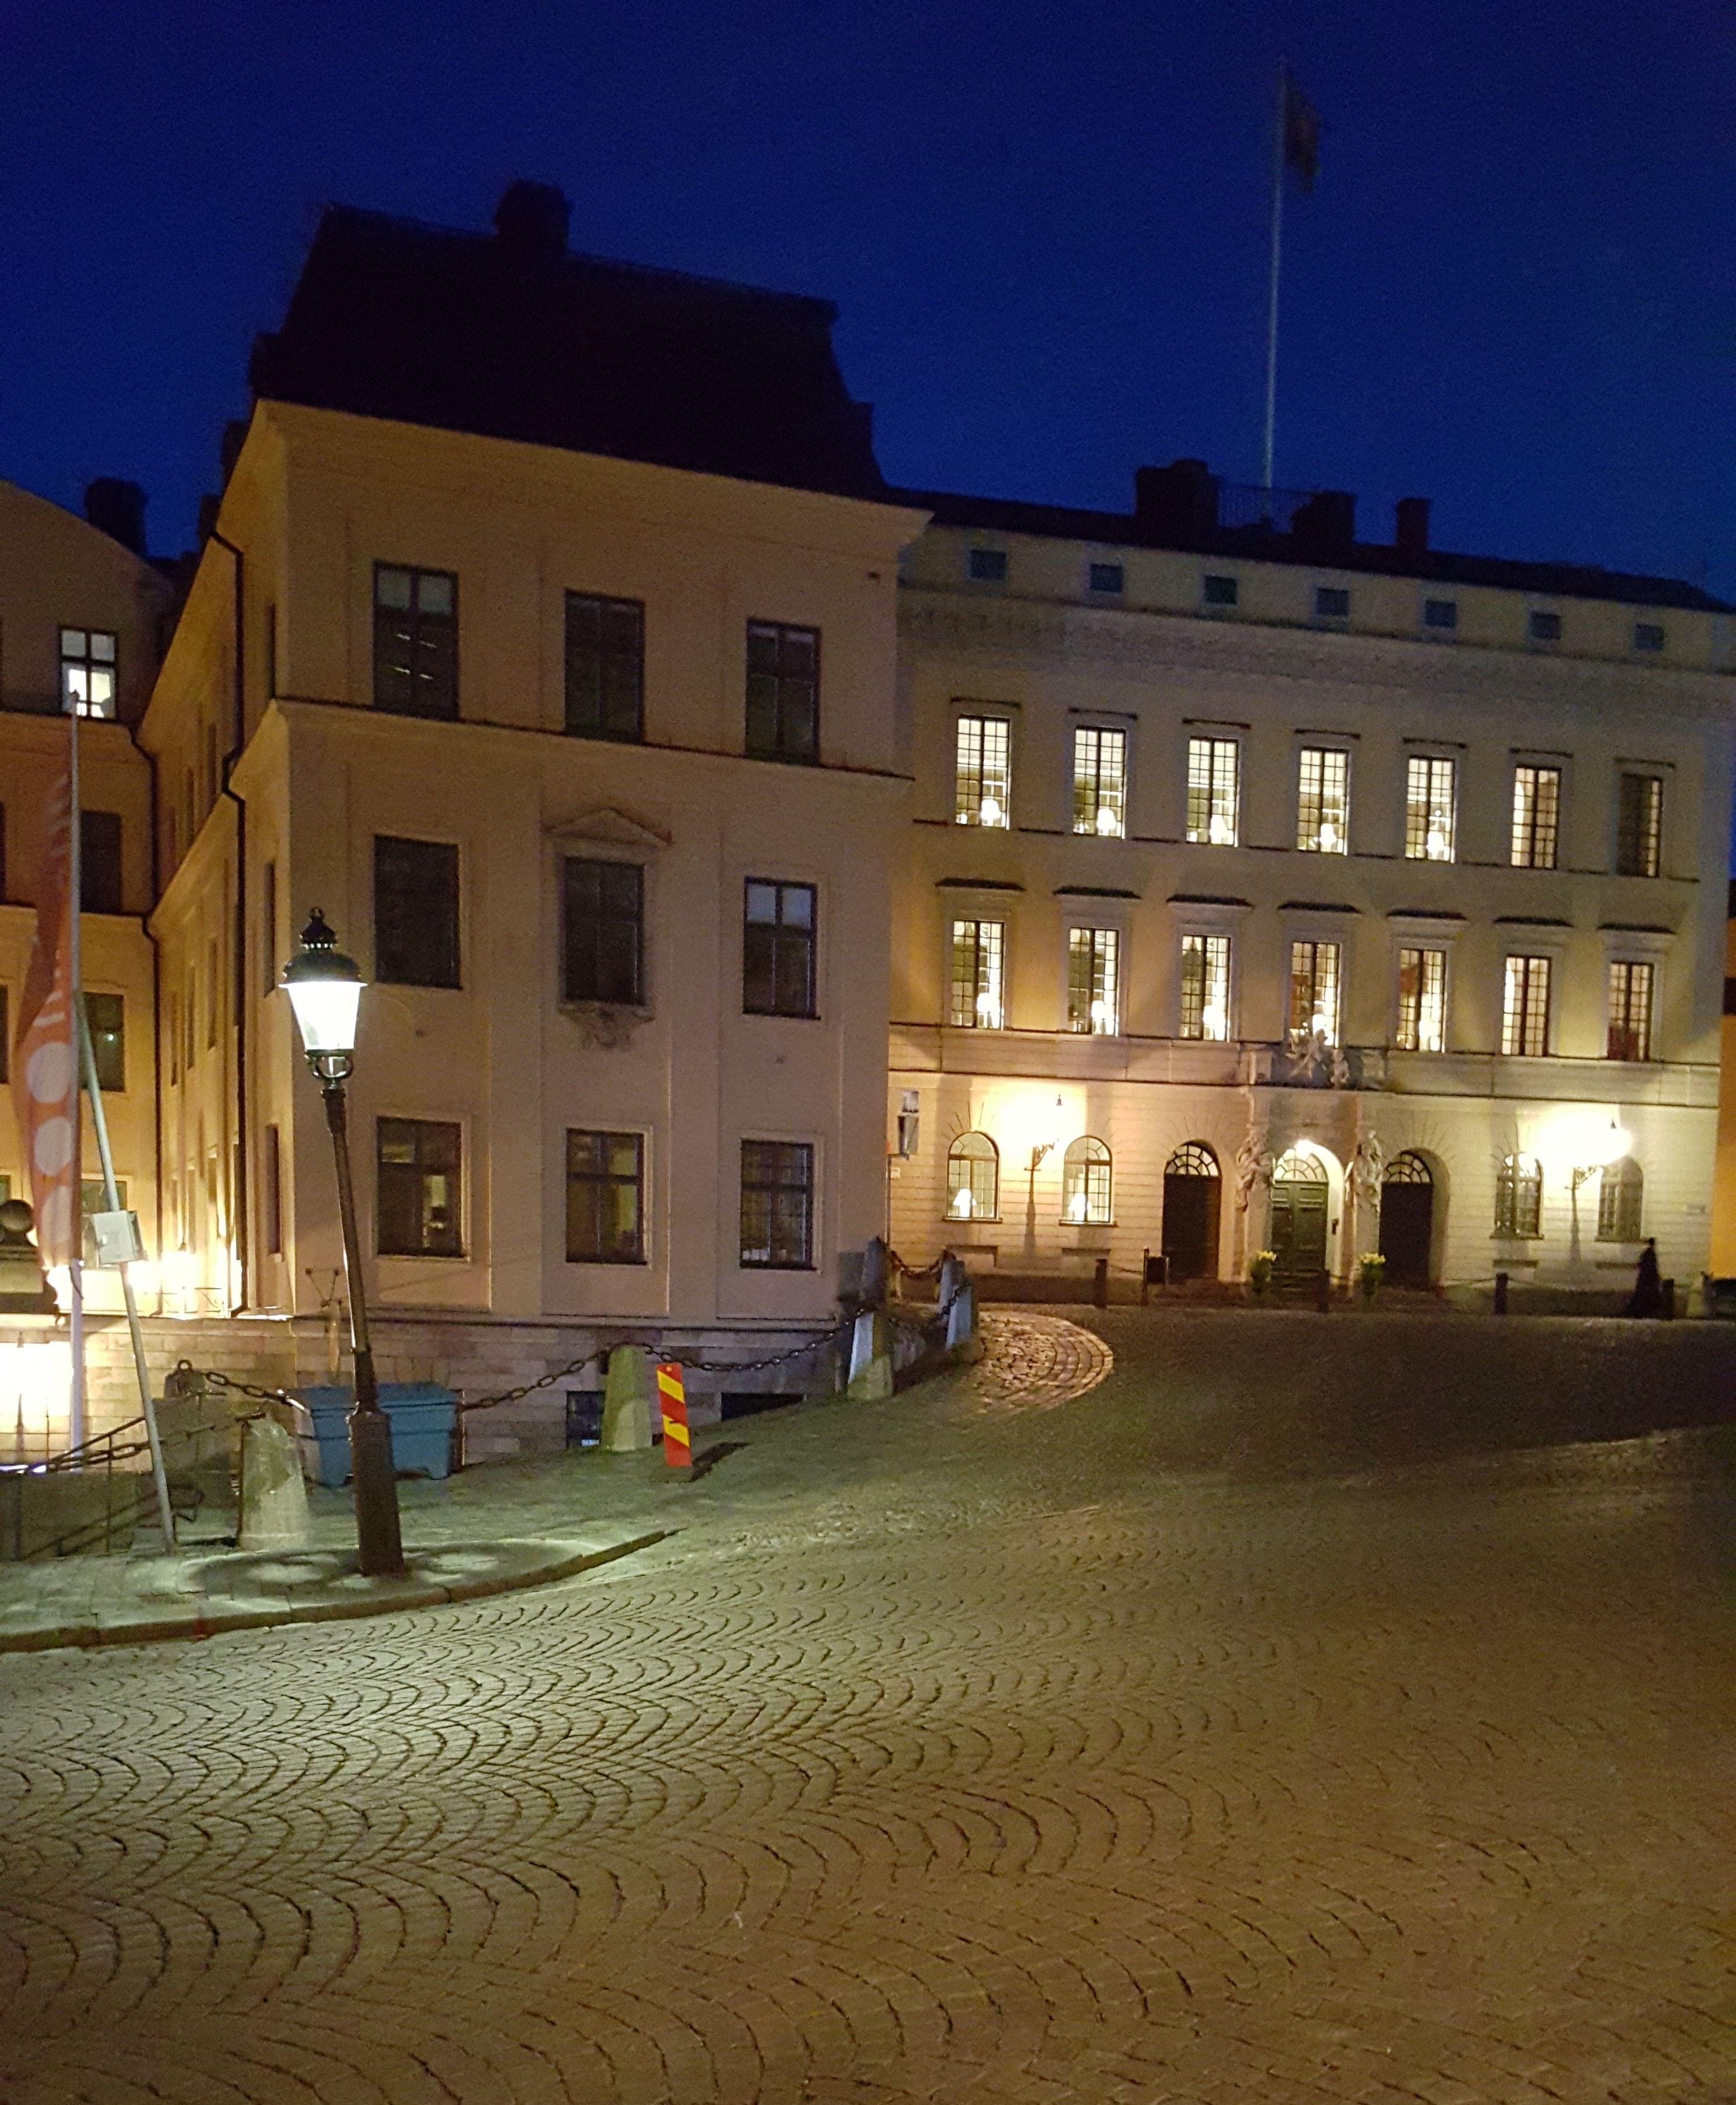 Mordvandring, Stadsvandringar i Stockholm